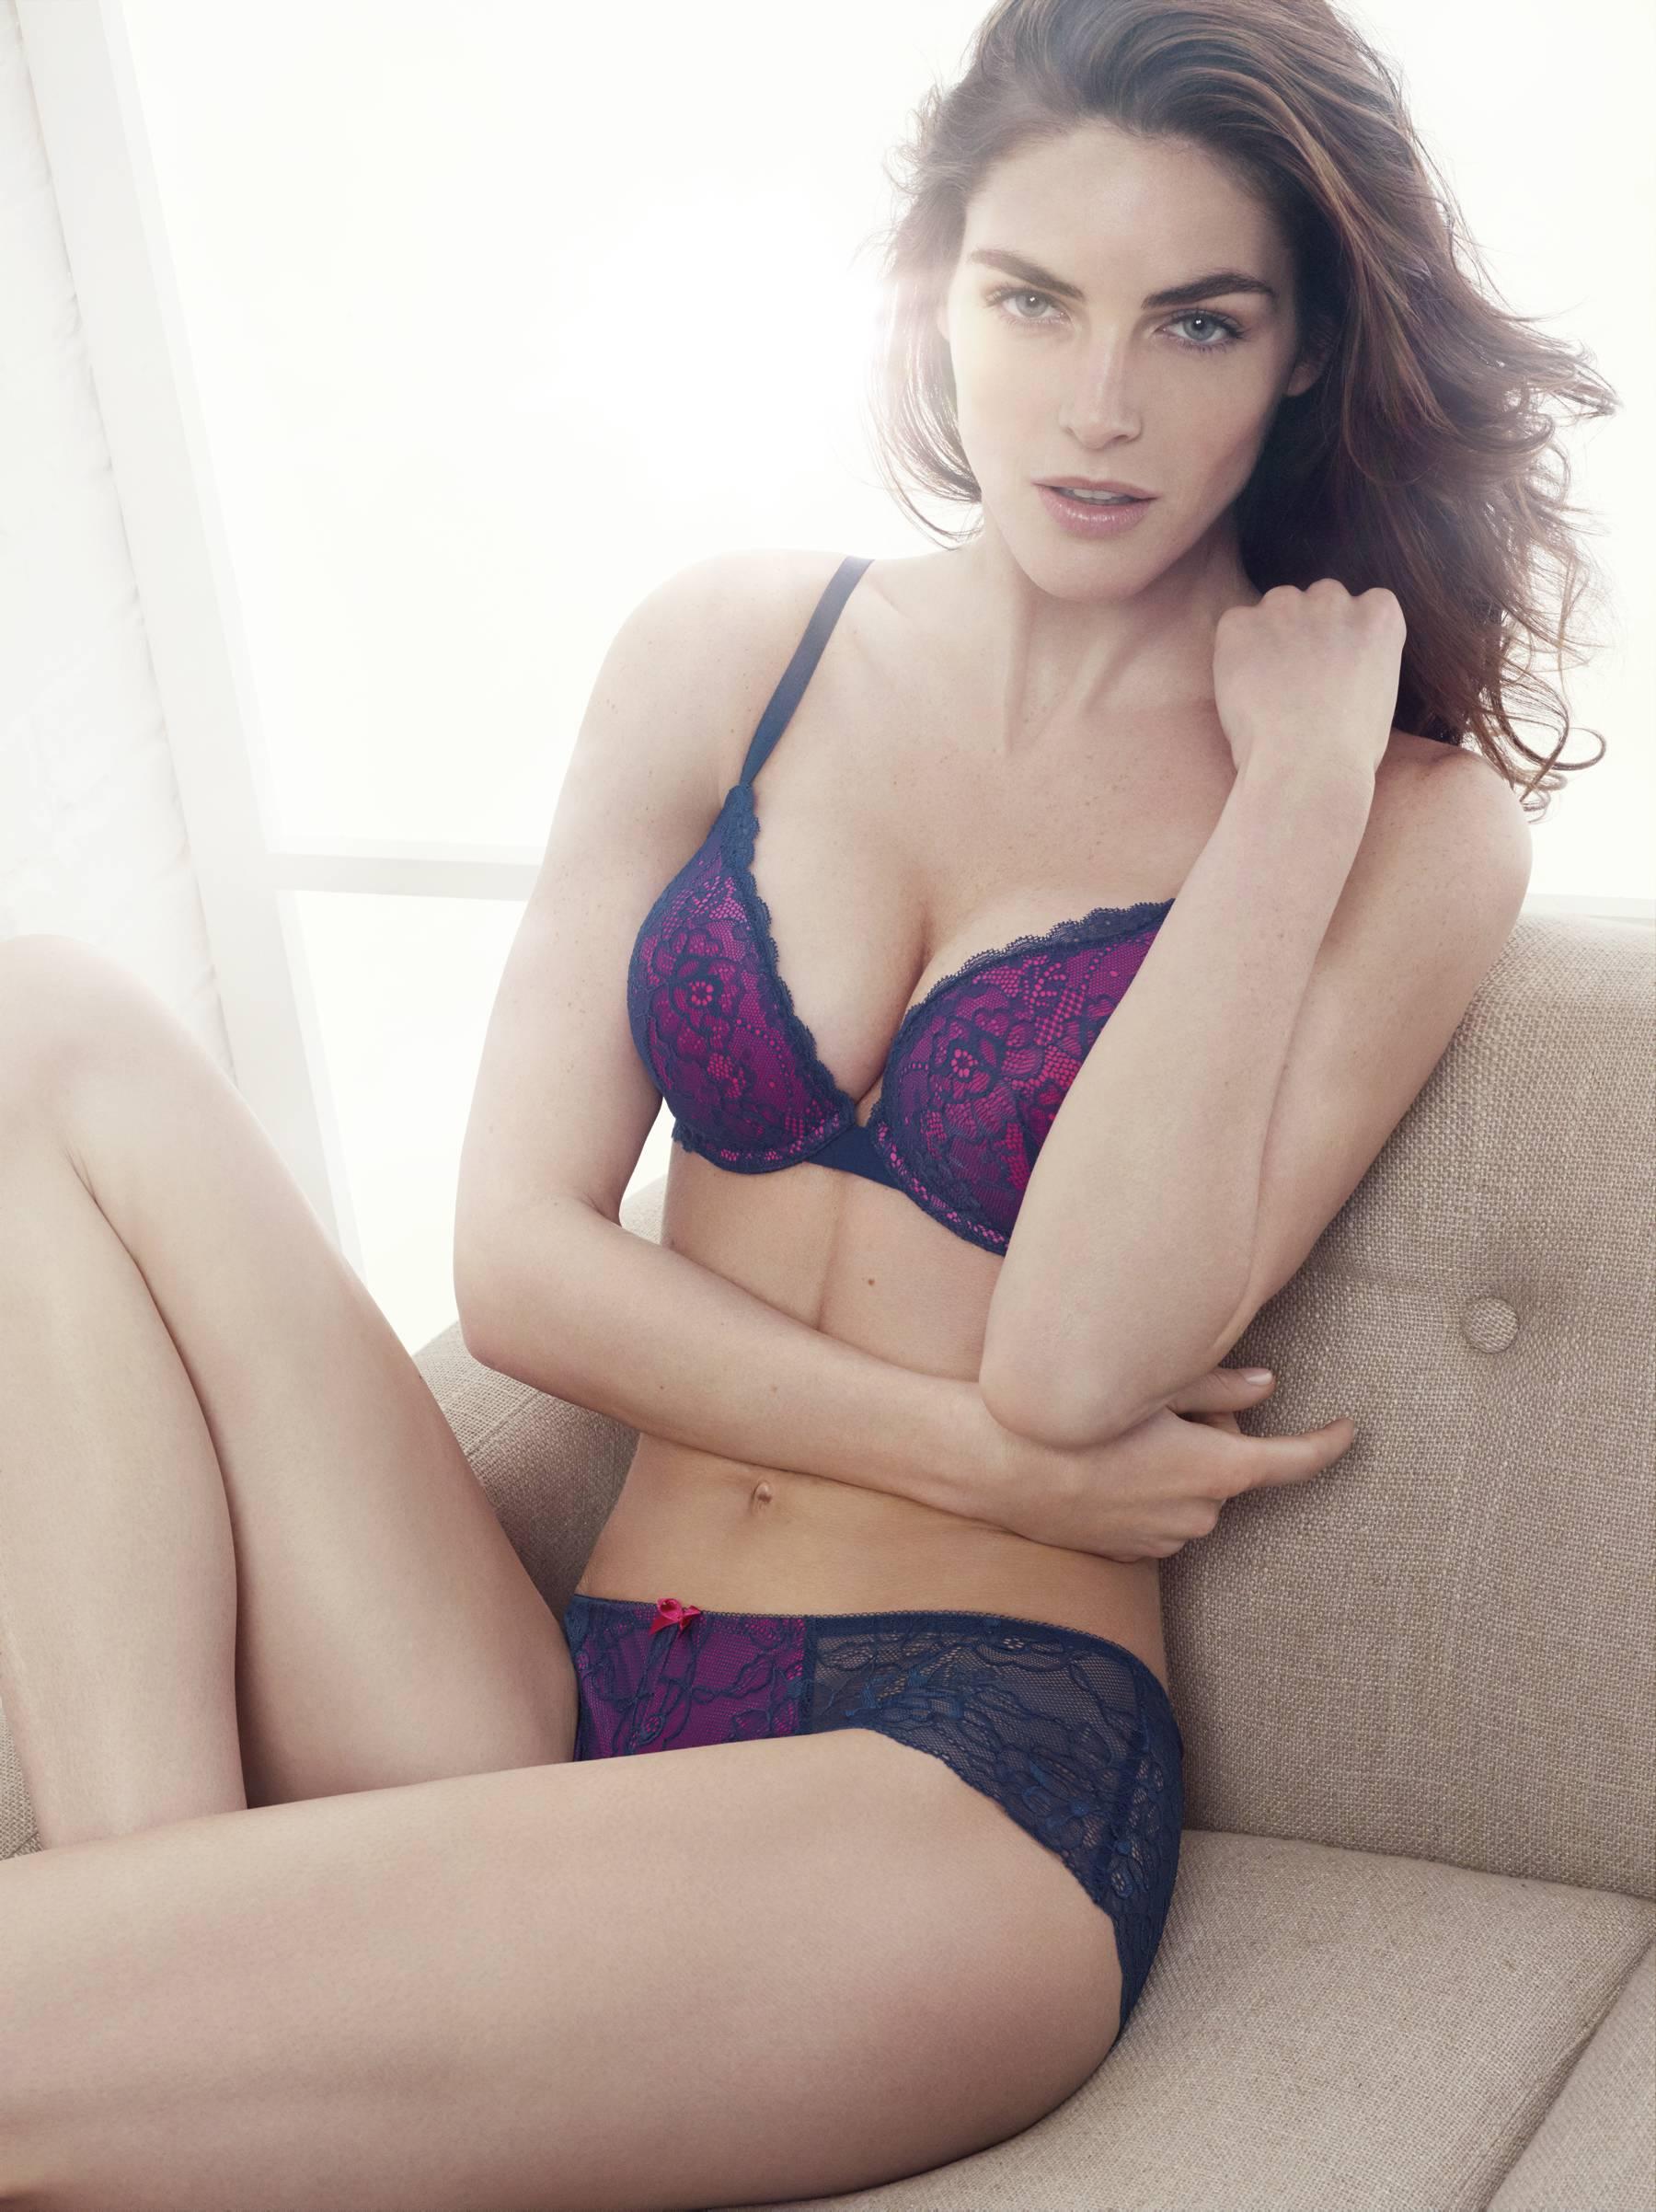 The lovely spring lingerie | Lindex Group